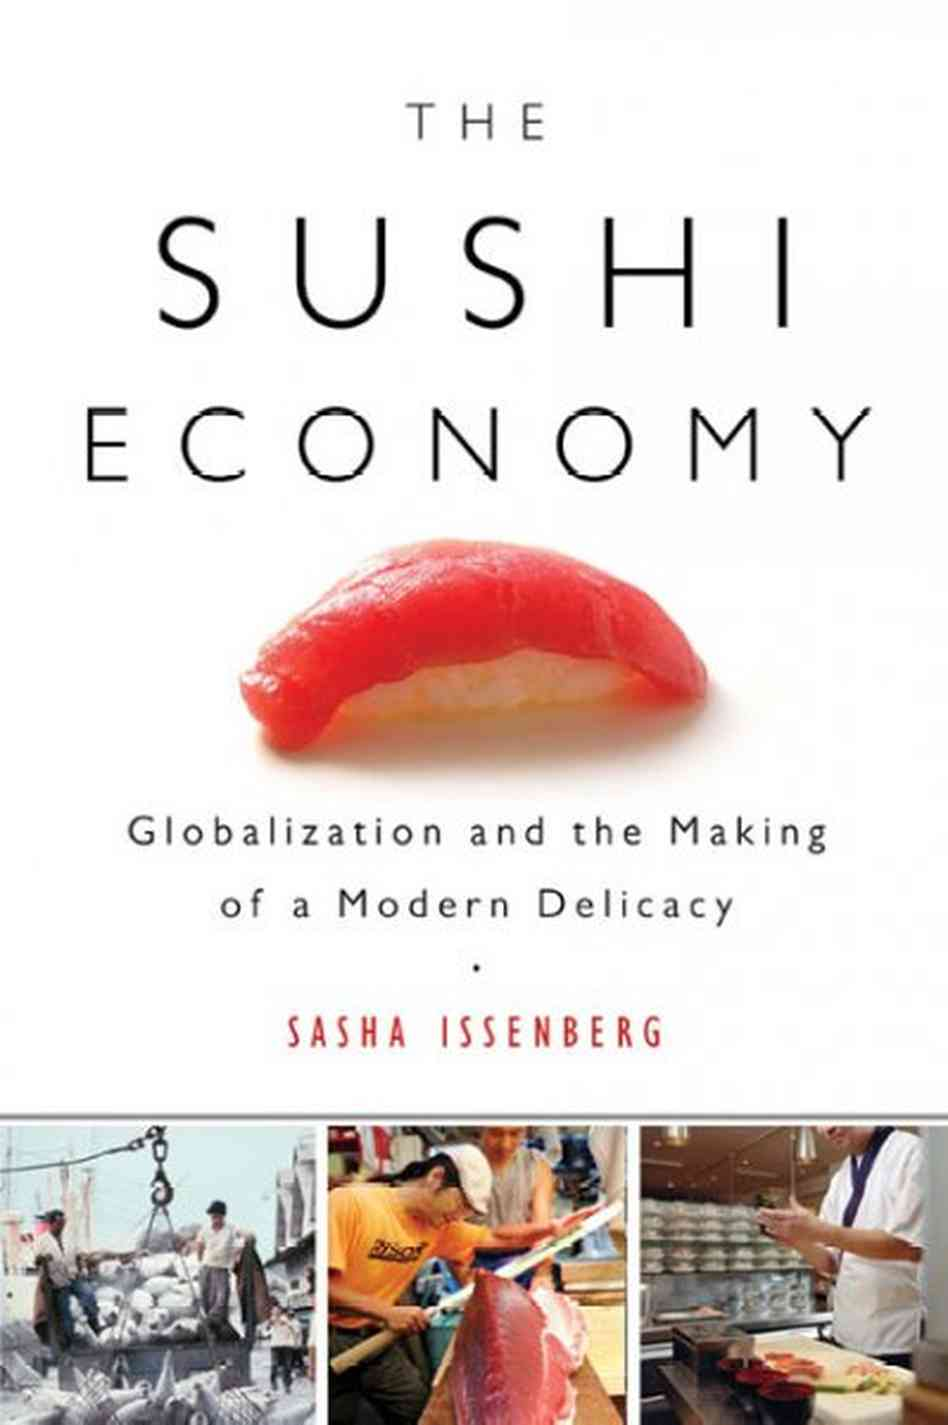 Sushi Economy, The 1.jpg